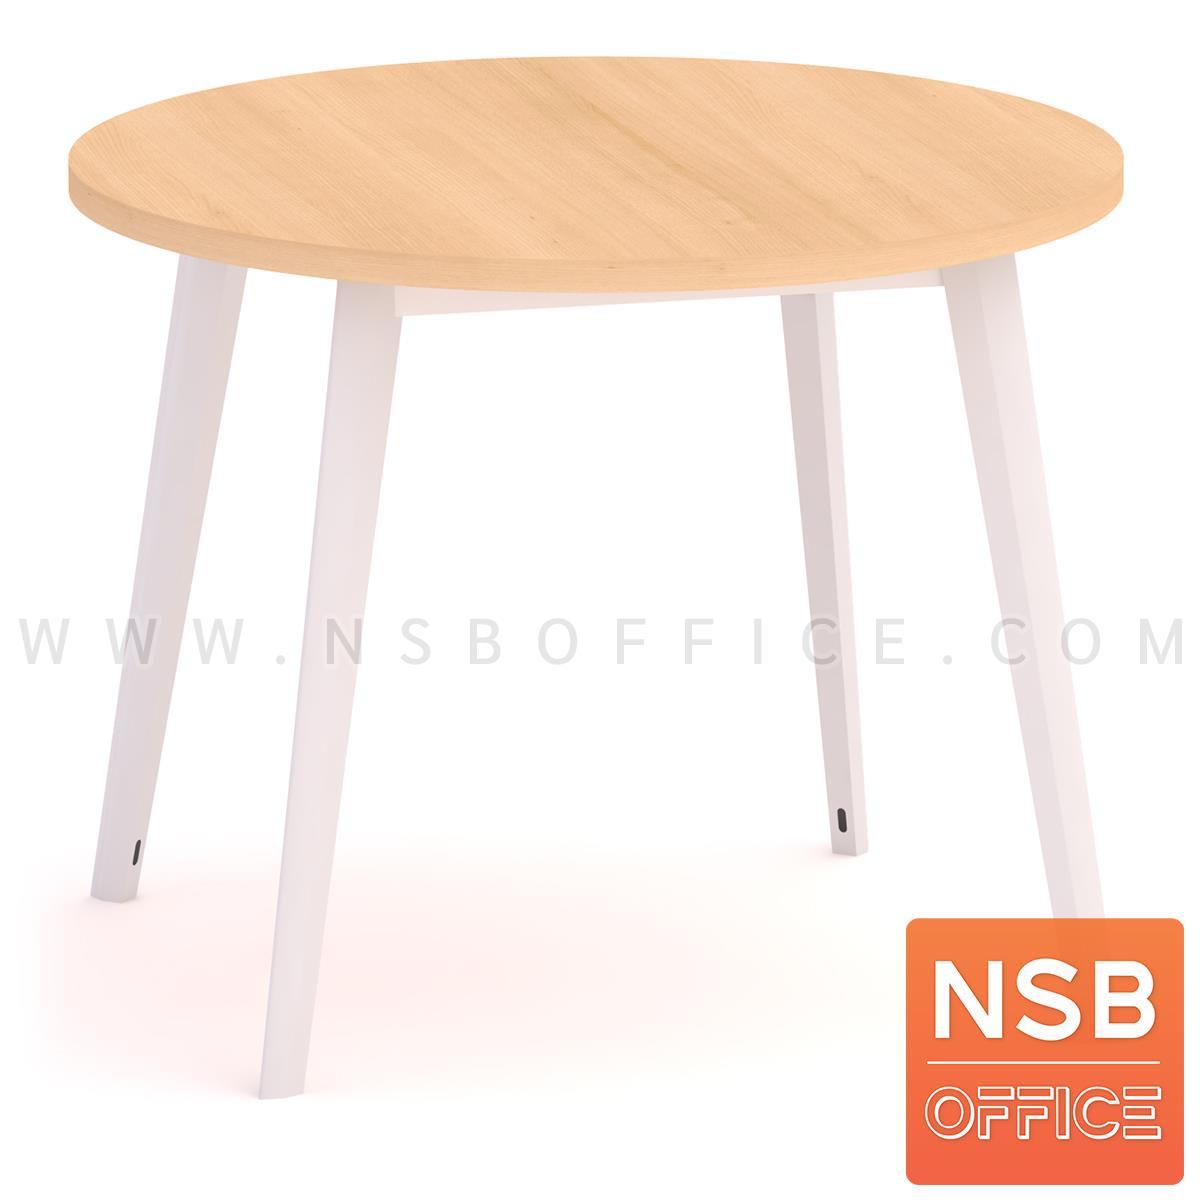 A31A004:โต๊ะประชุมทรงกลม รุ่น Aston (แอสตัน) ขนาด 90Di, 120Di cm.  ขาเหล็กพ่นสี